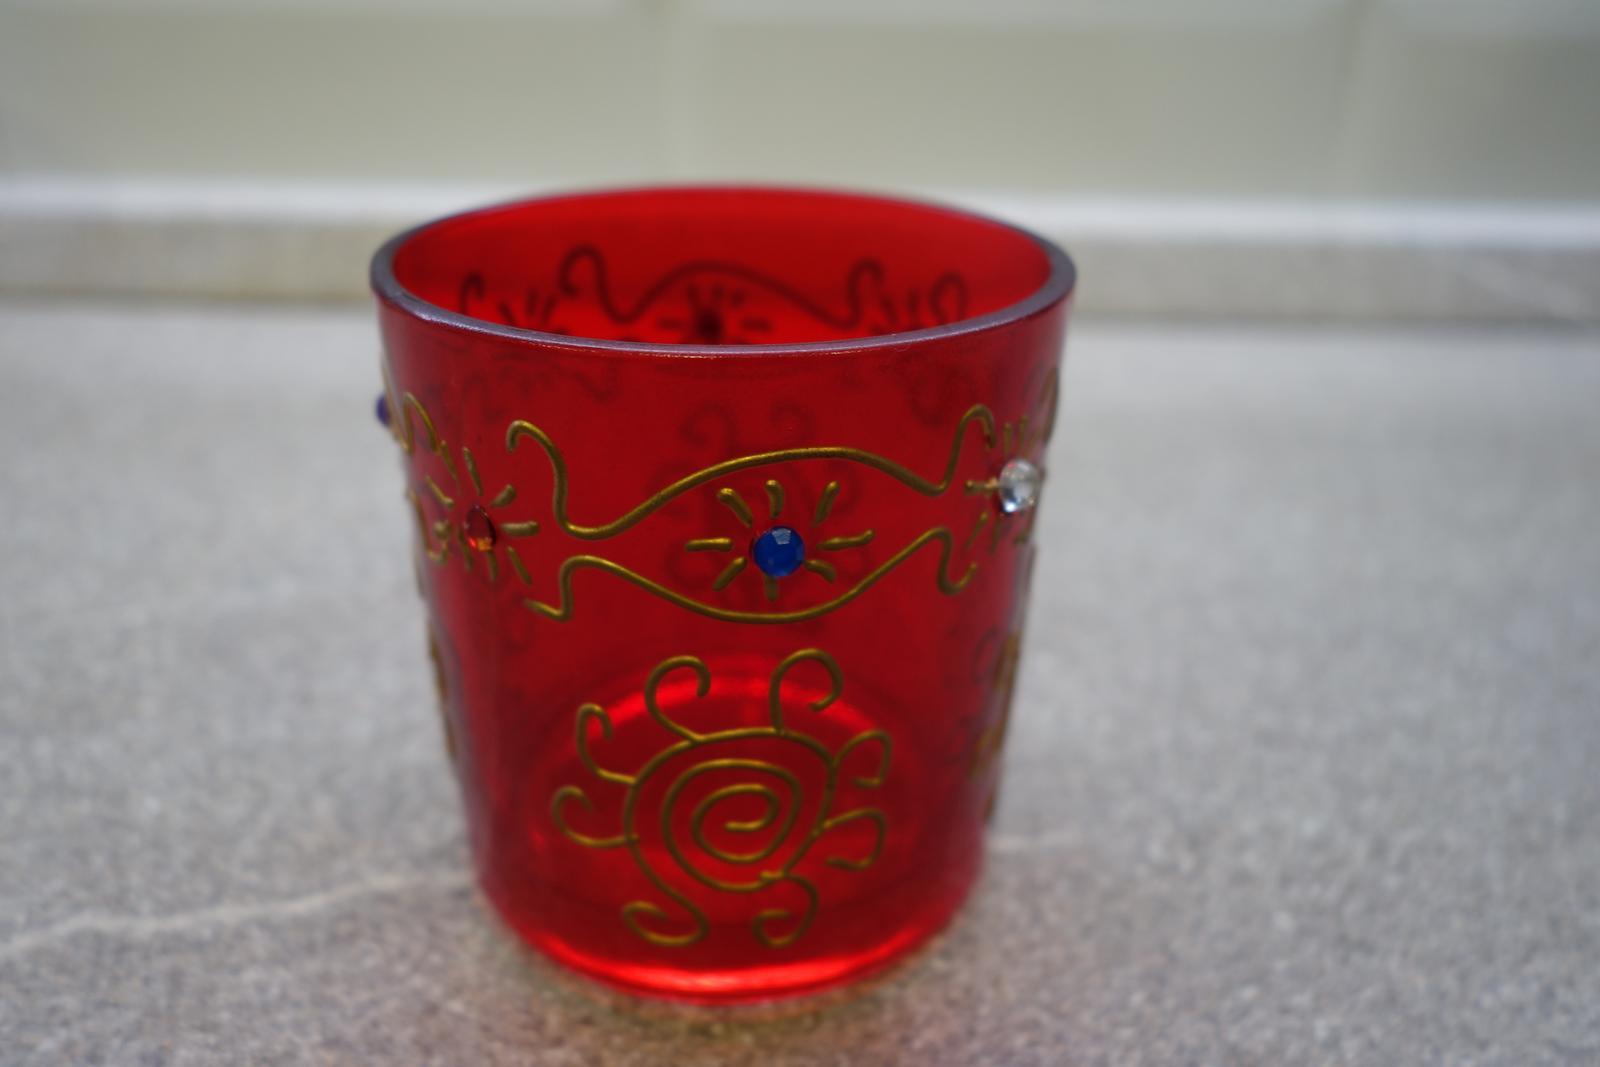 Svietnik na čajovú sviečku - Obrázok č. 2